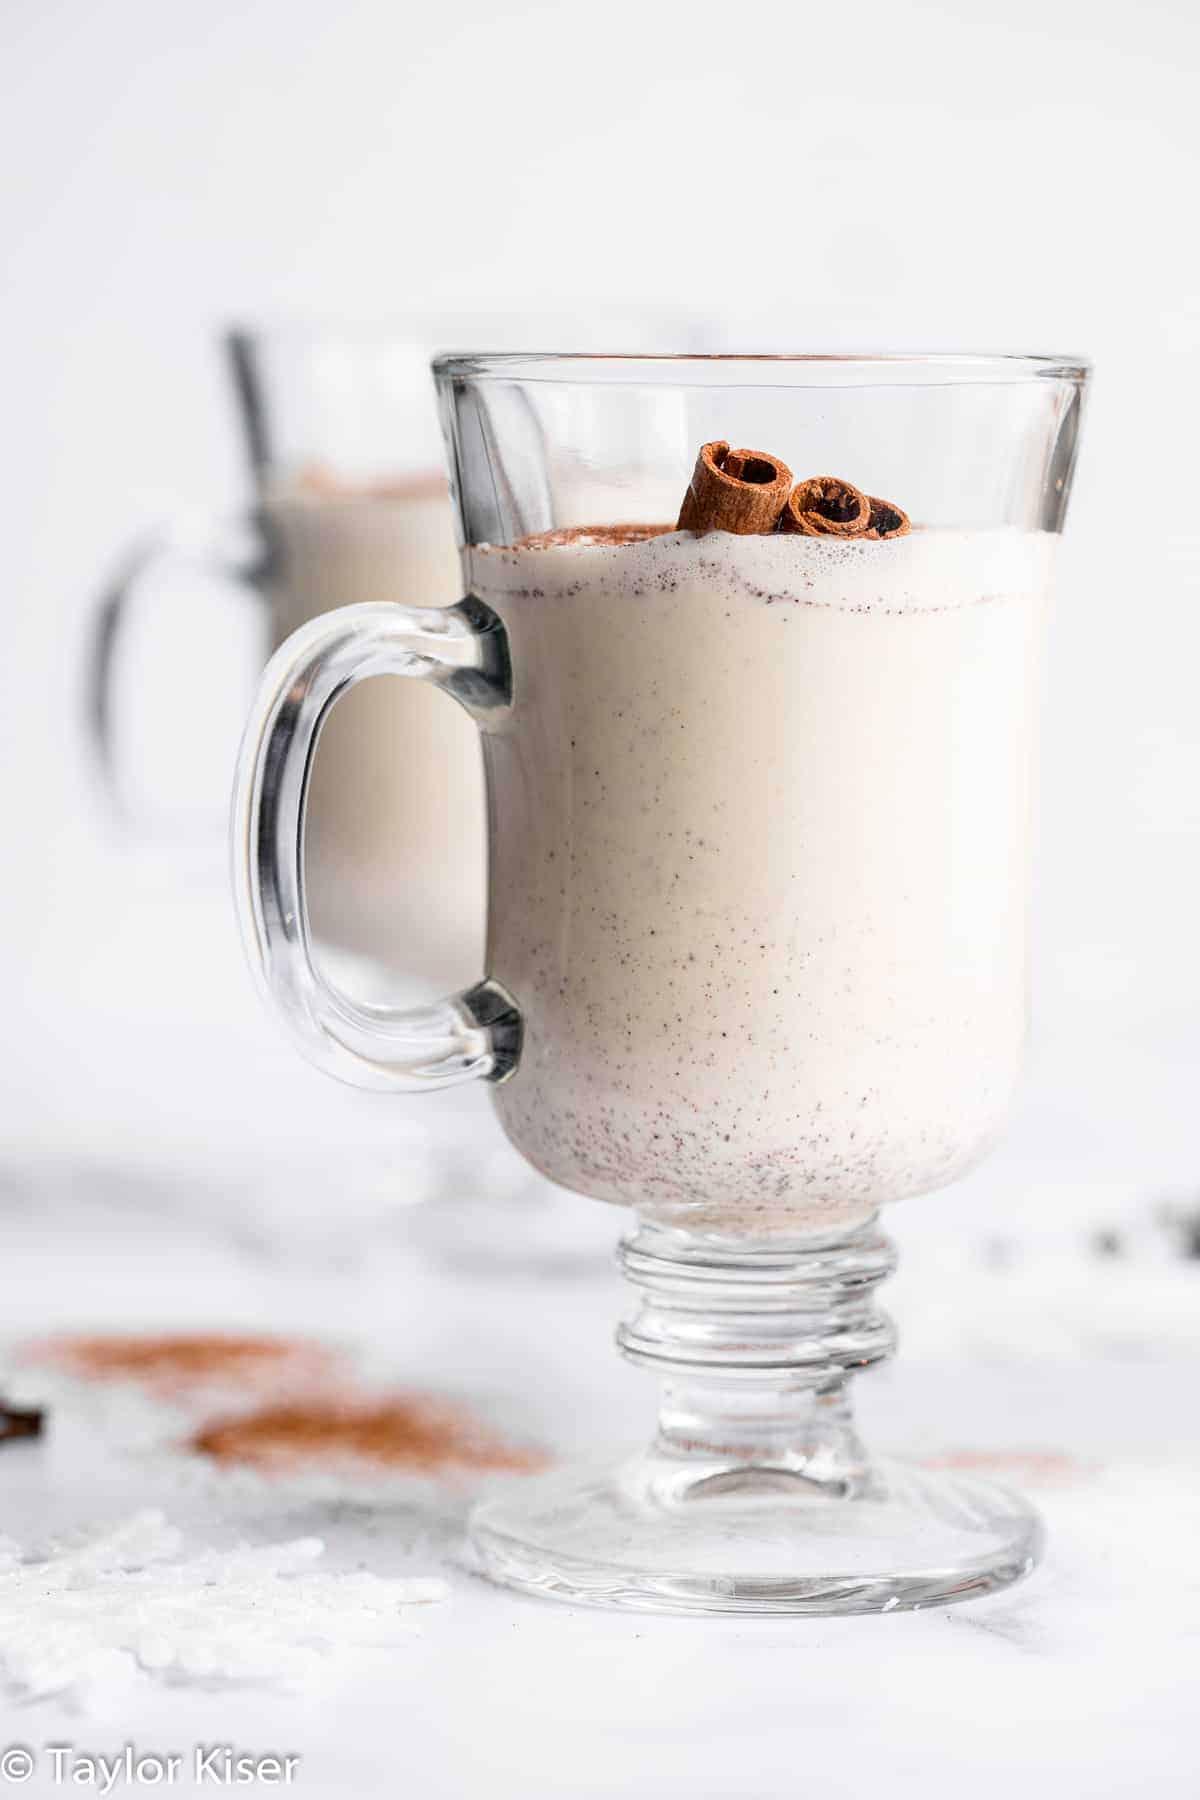 A glass of sugar free eggnog with cinnamon sticks in it